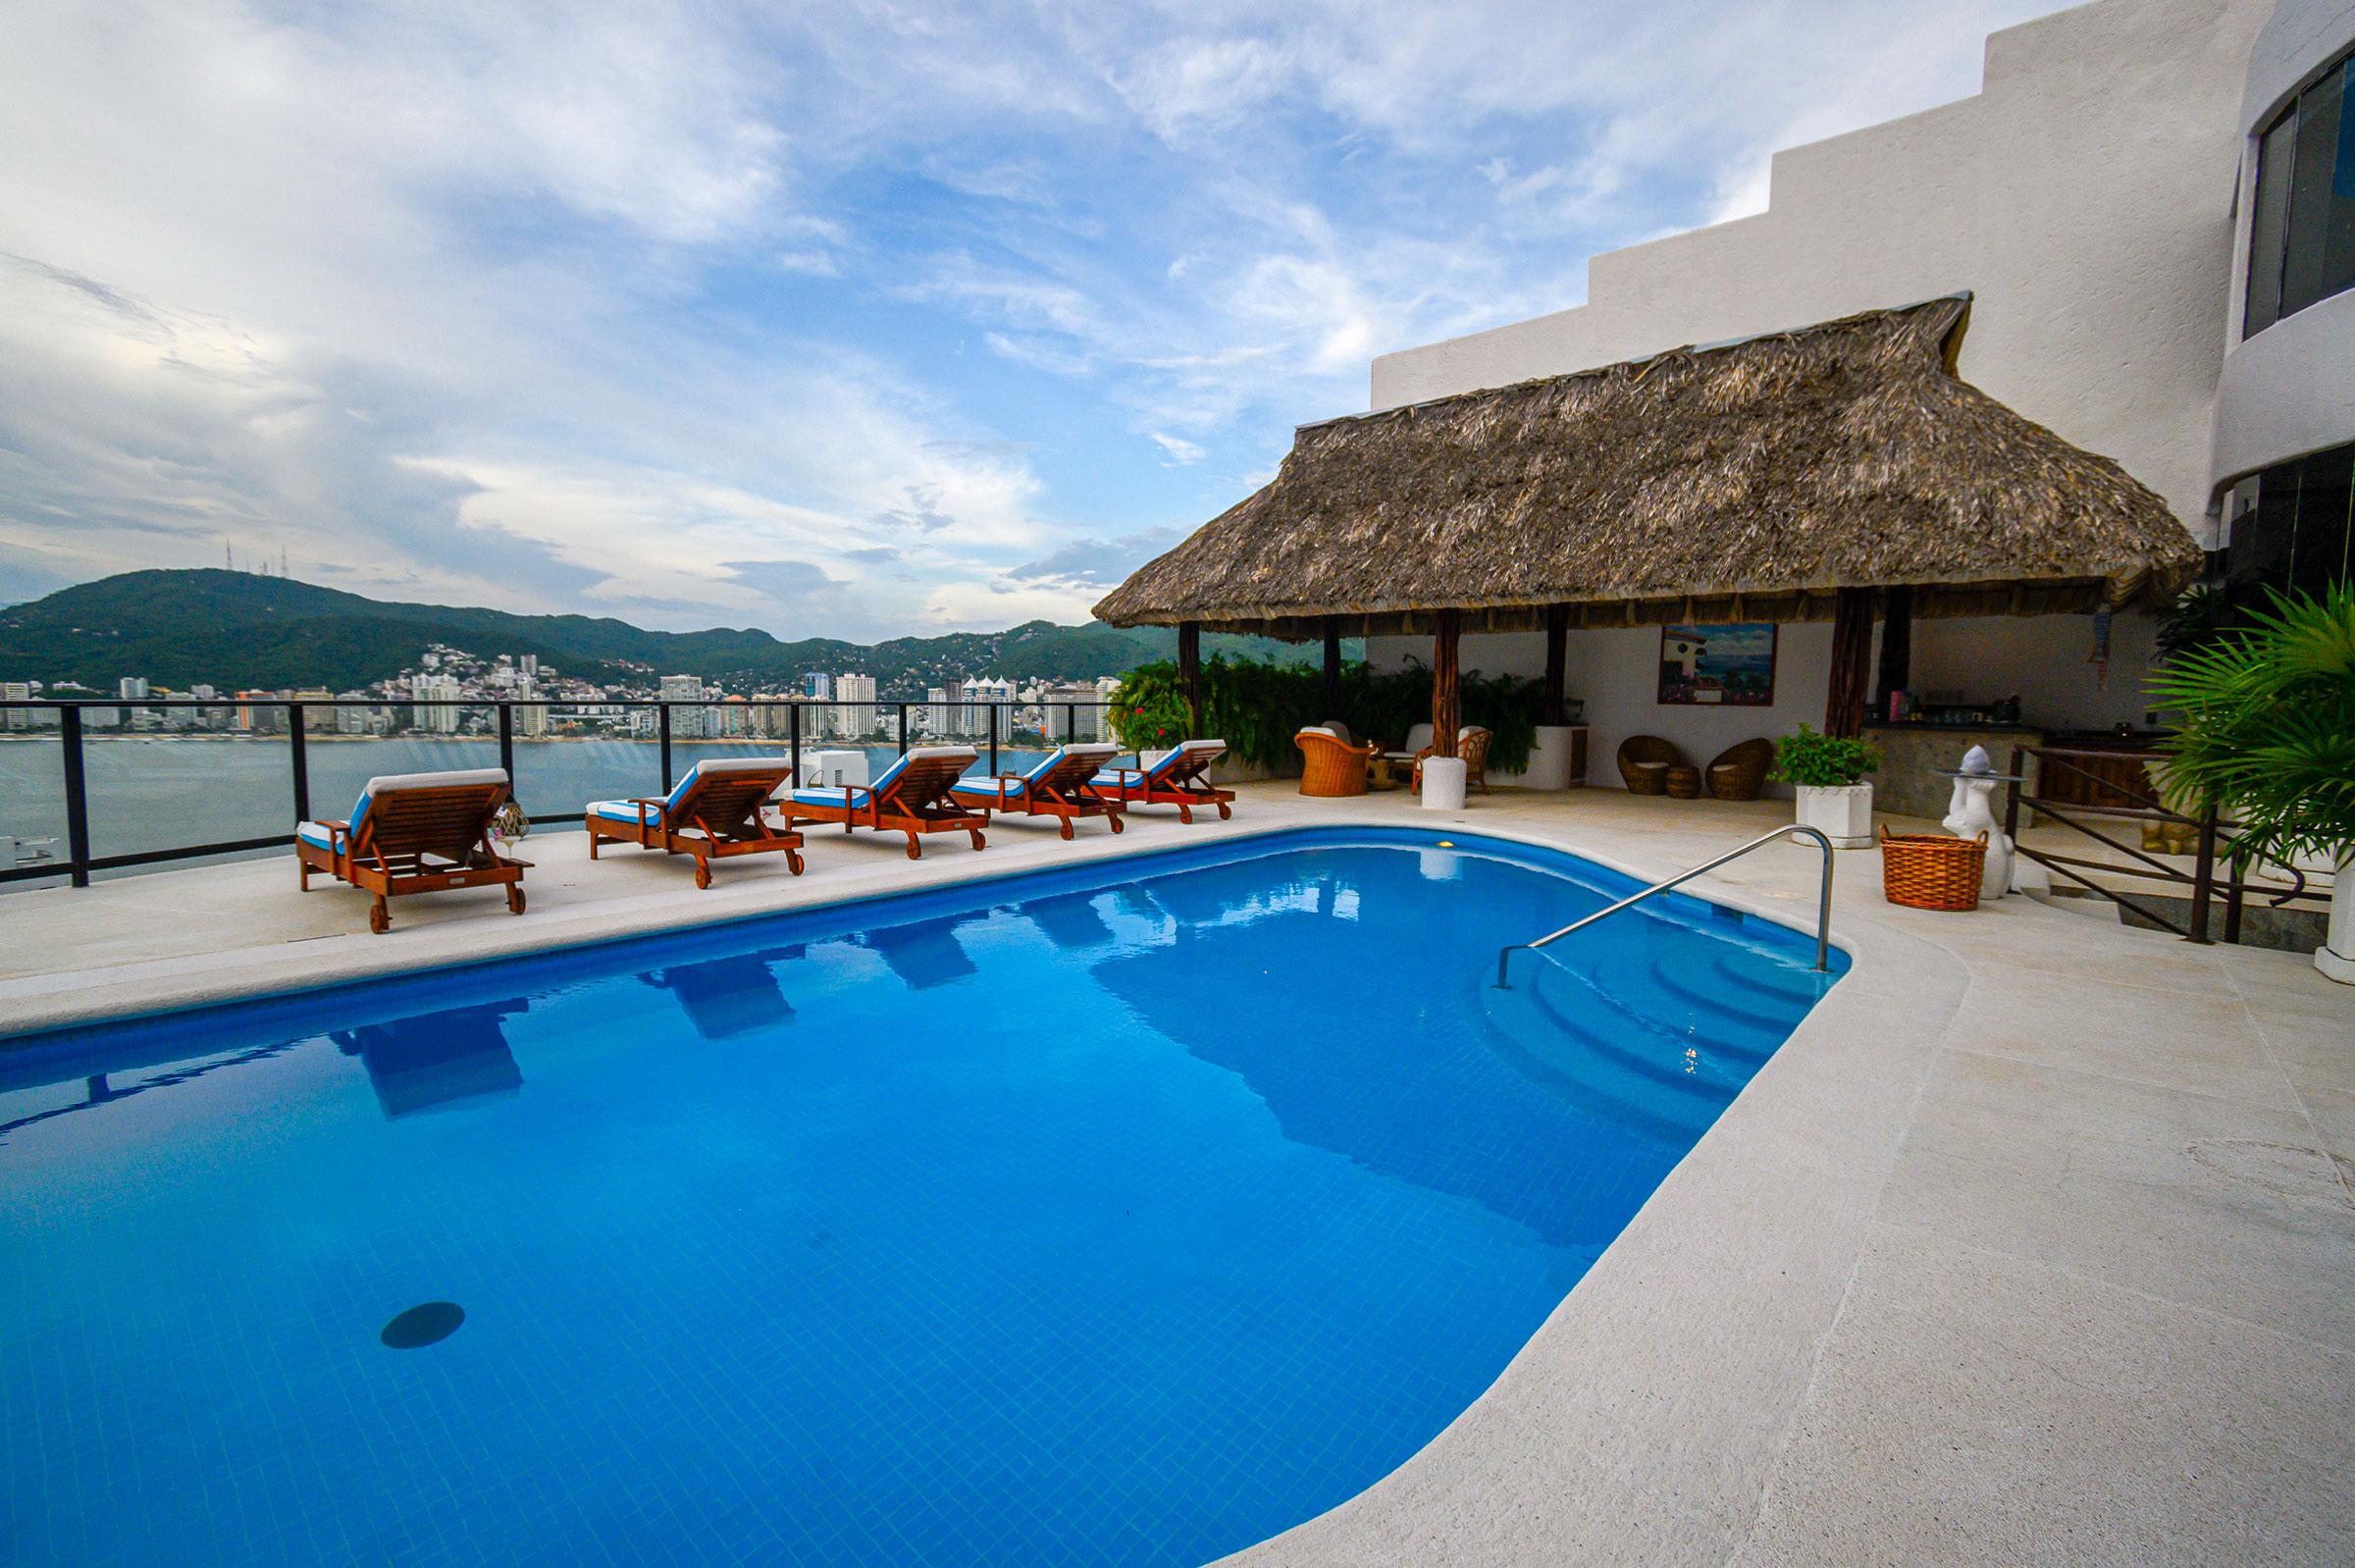 Pool area at Casa Buenos Aires, Acapulco